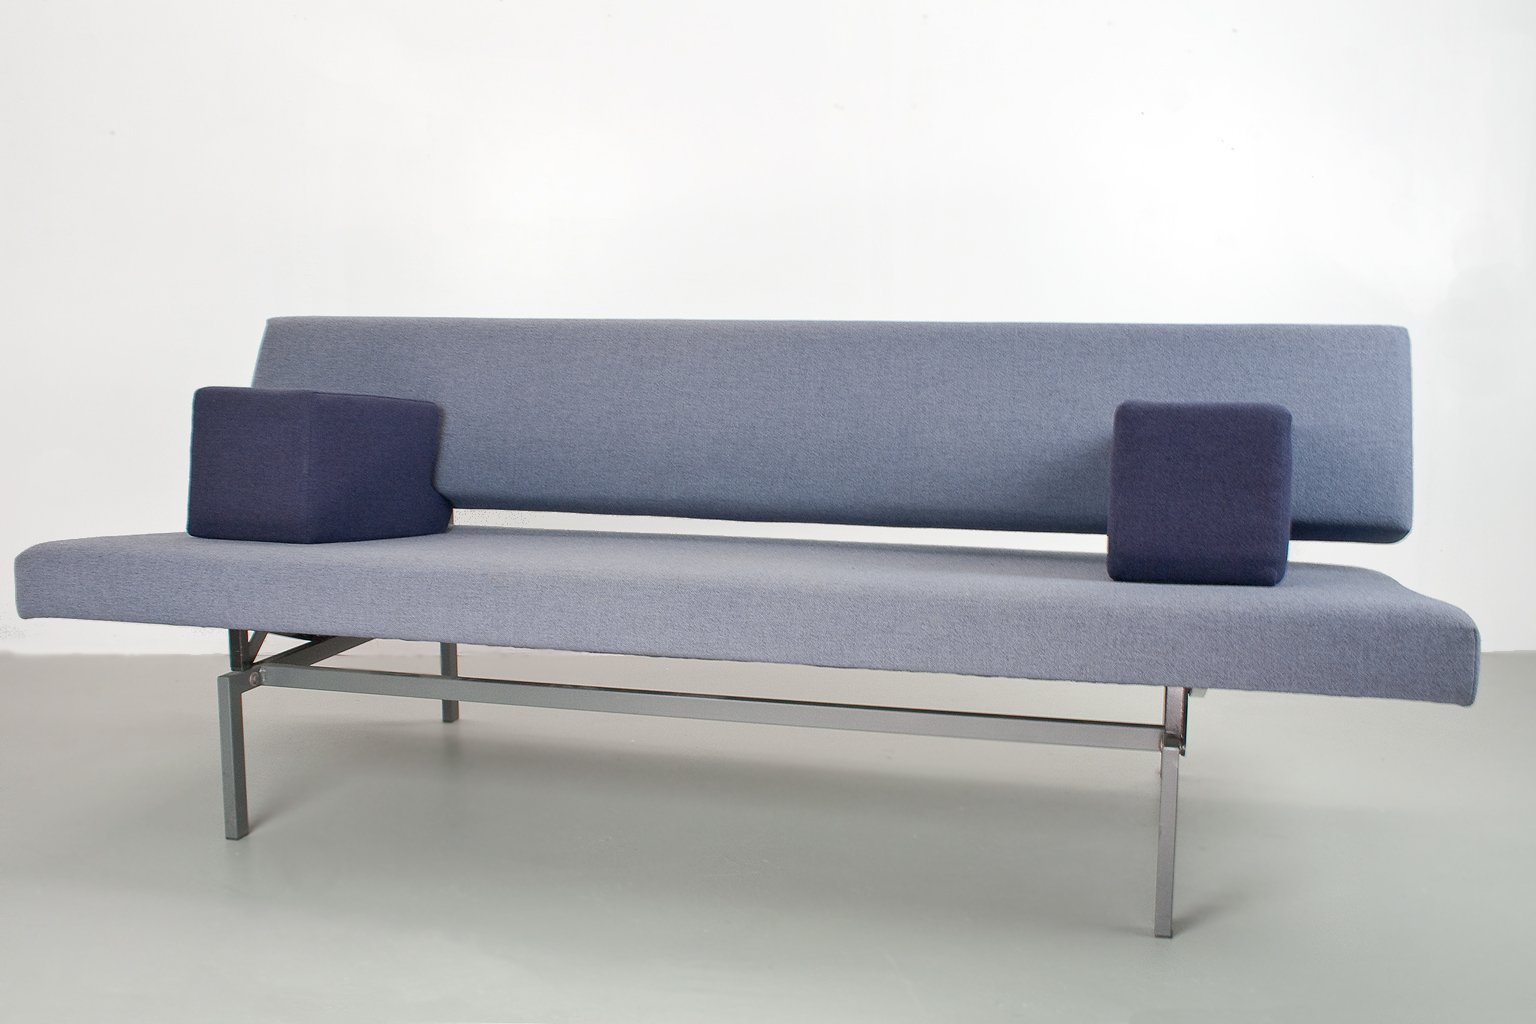 Model 540 sofa bed by van der sluis 1960s for sale at pamono - Sofa van de hoek uitstekende ...